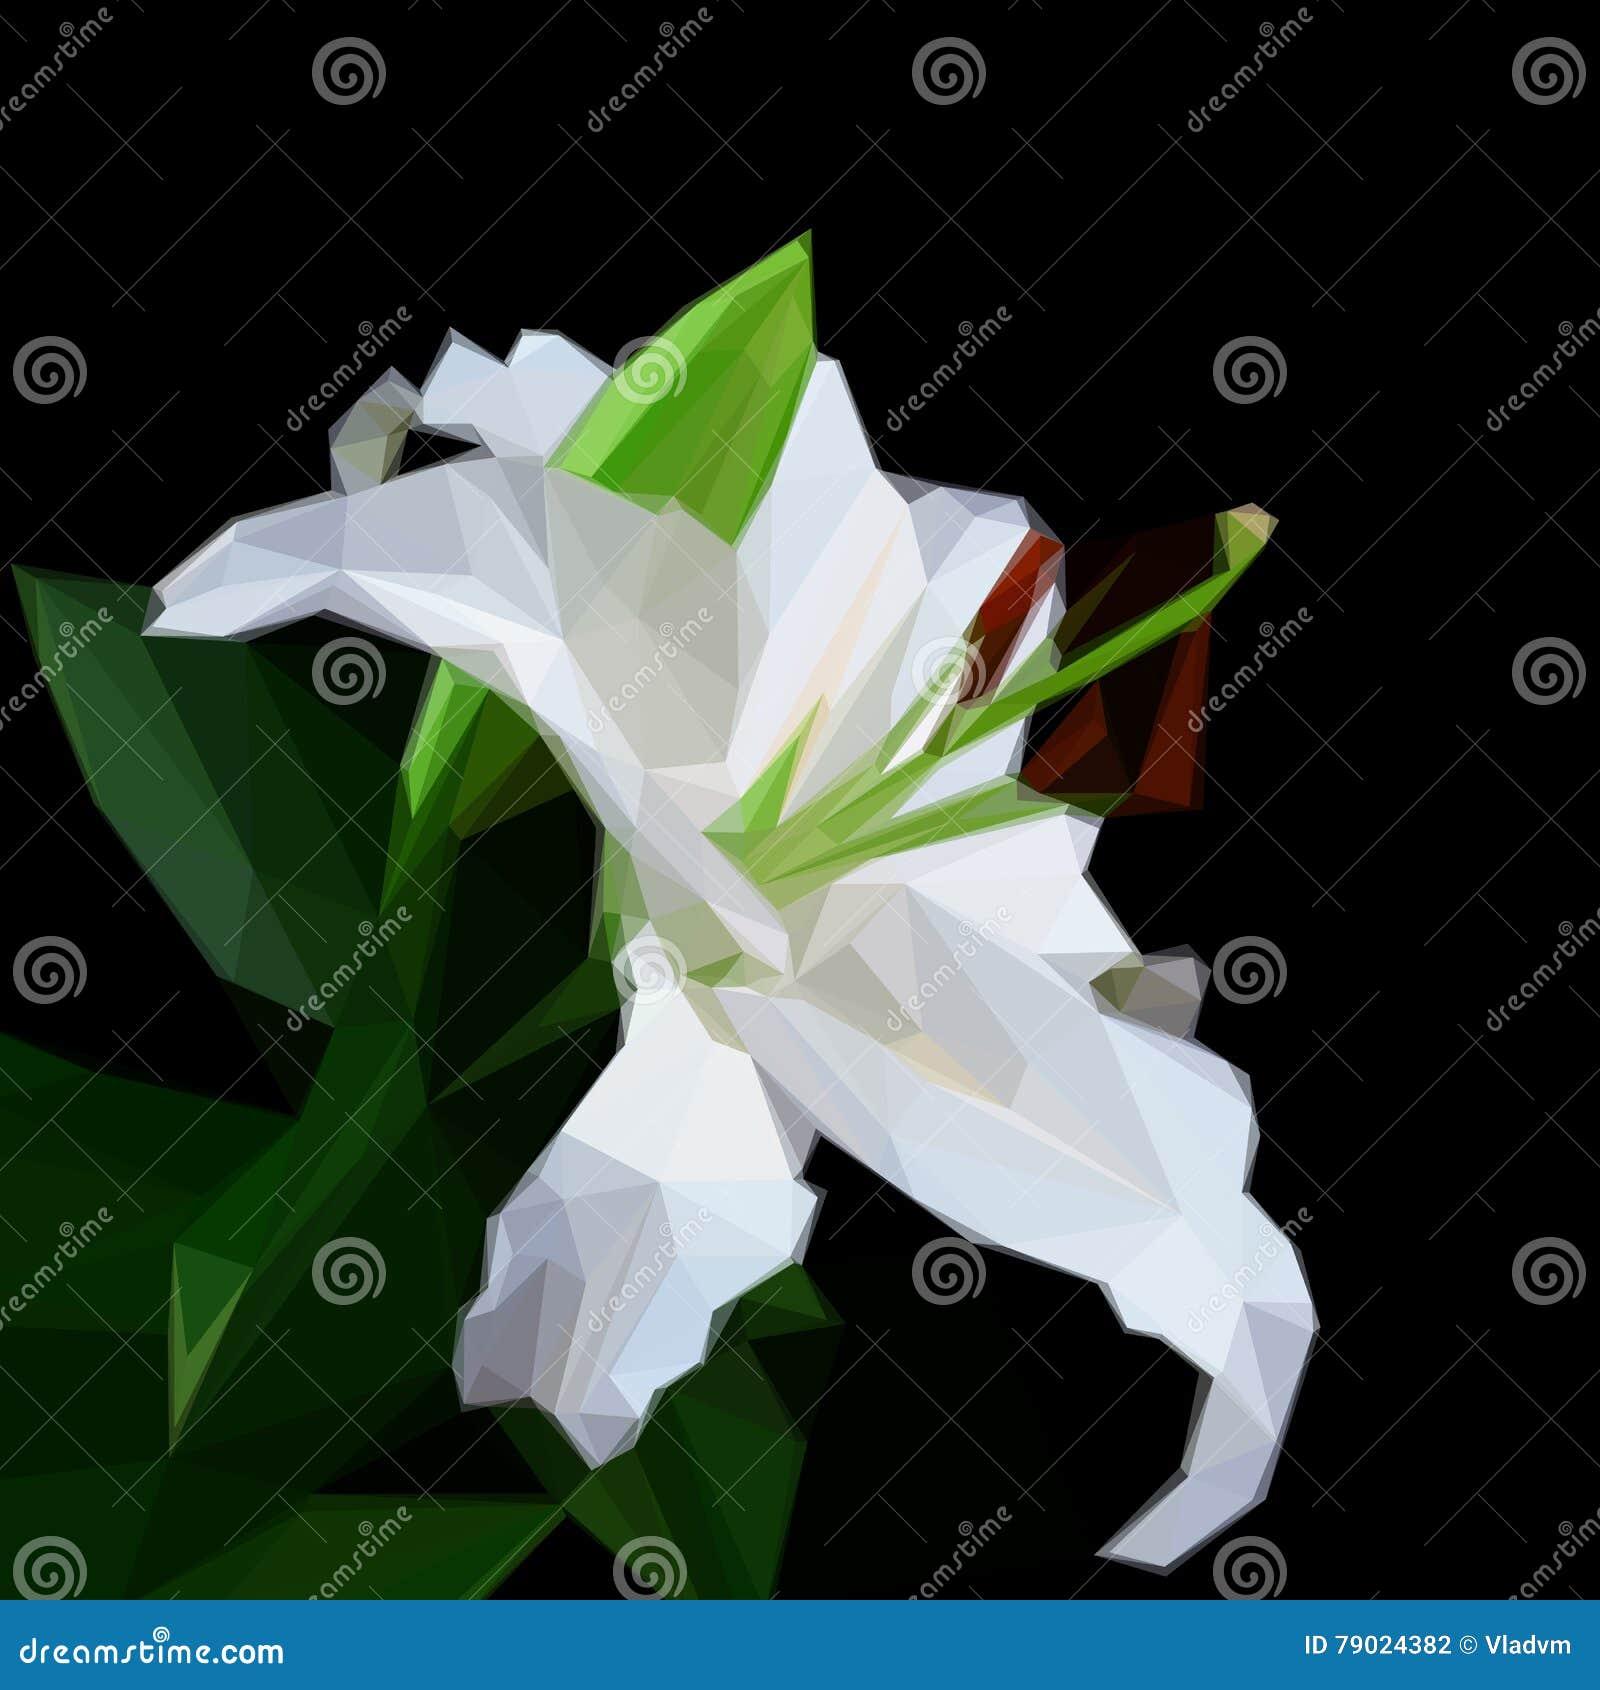 Flowers lily on black background flower symbol geometric download comp izmirmasajfo